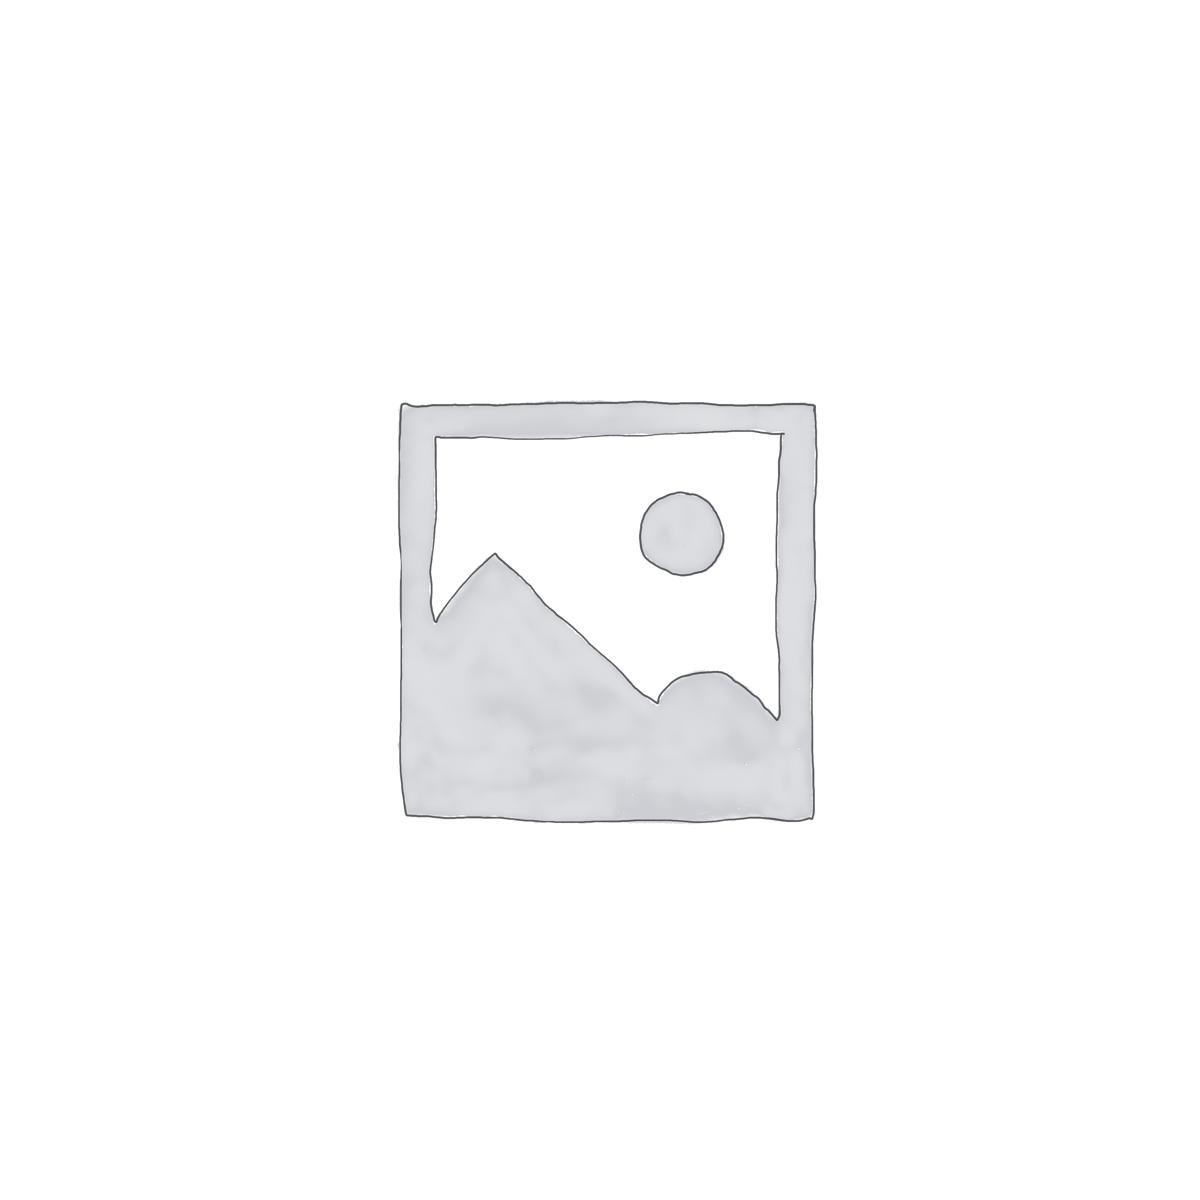 Poppy Drawing Floral Wallpaper Mural